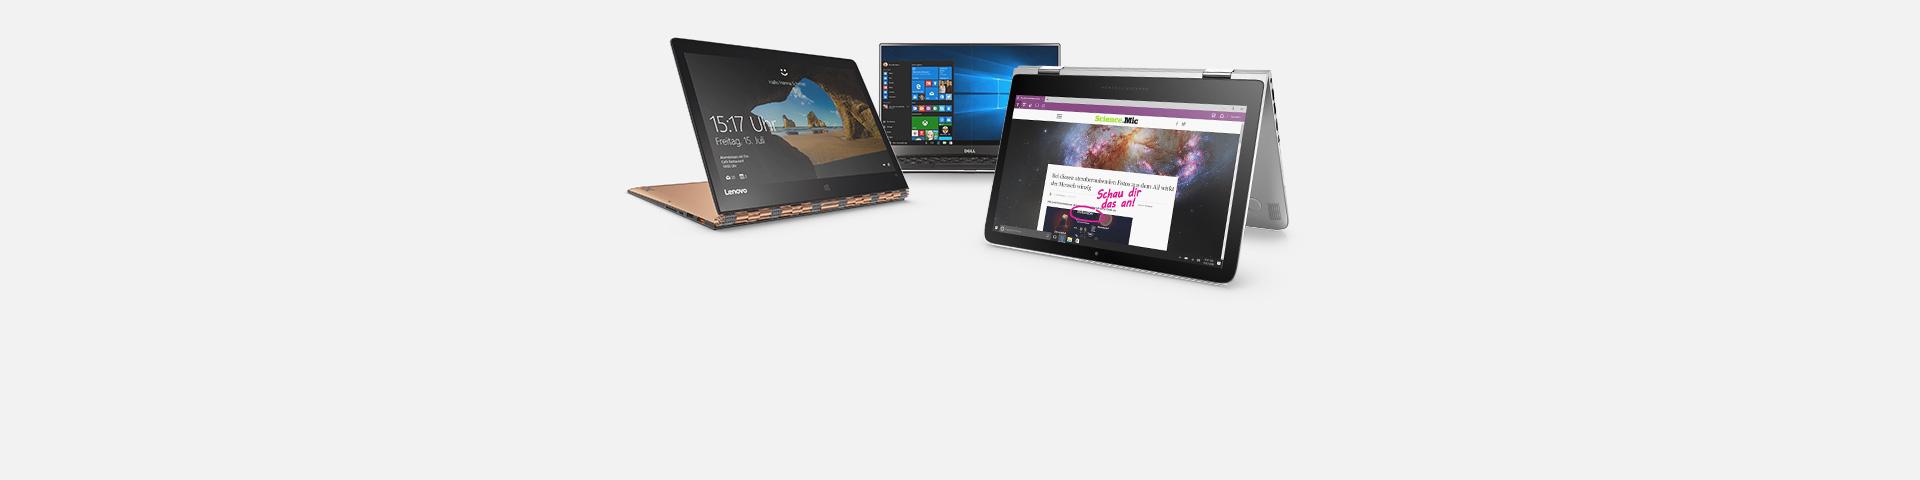 Drei Laptops